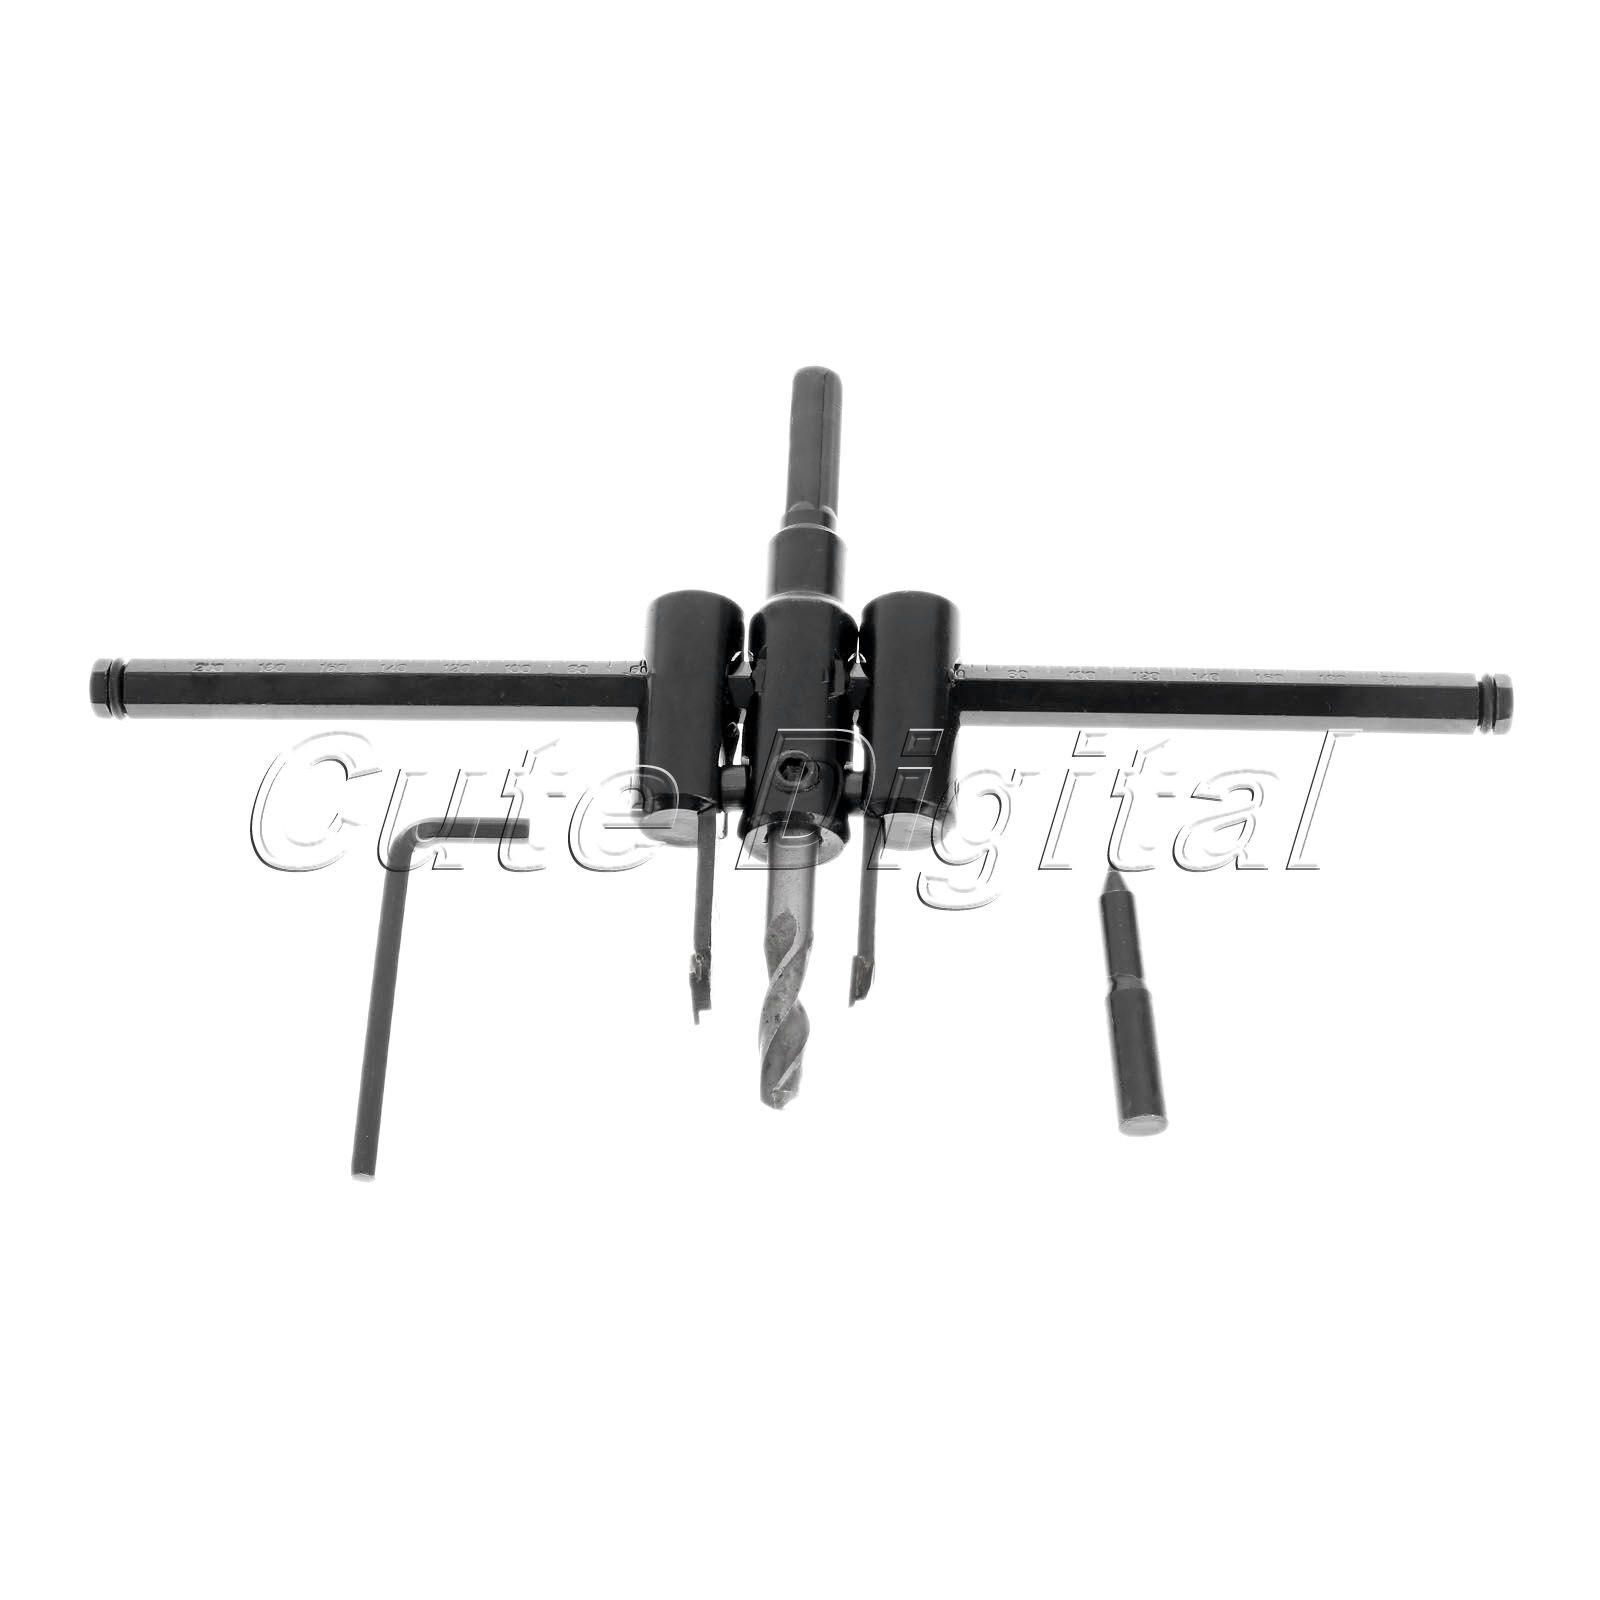 30mm-200mm Adjustable Metal Wood Circle Hole Saw Drill Bit Cutter Kit DIY Tool Herramientas Power Tools Cordless Drill Bit